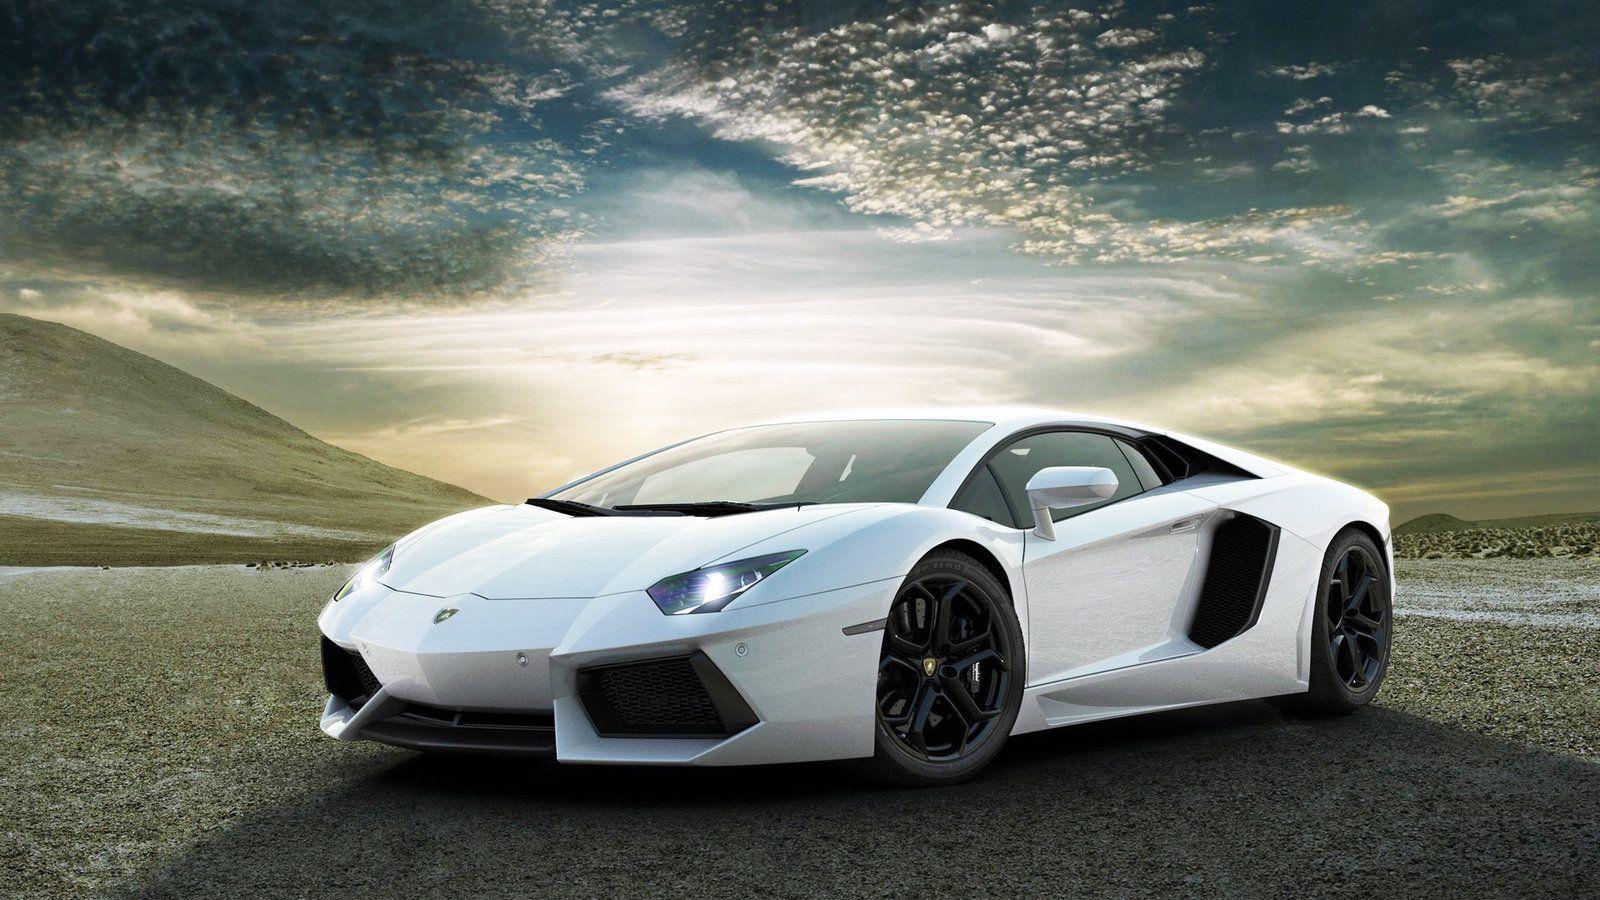 Sports Cars Lamborghini Wallpapers Top Free Sports Cars